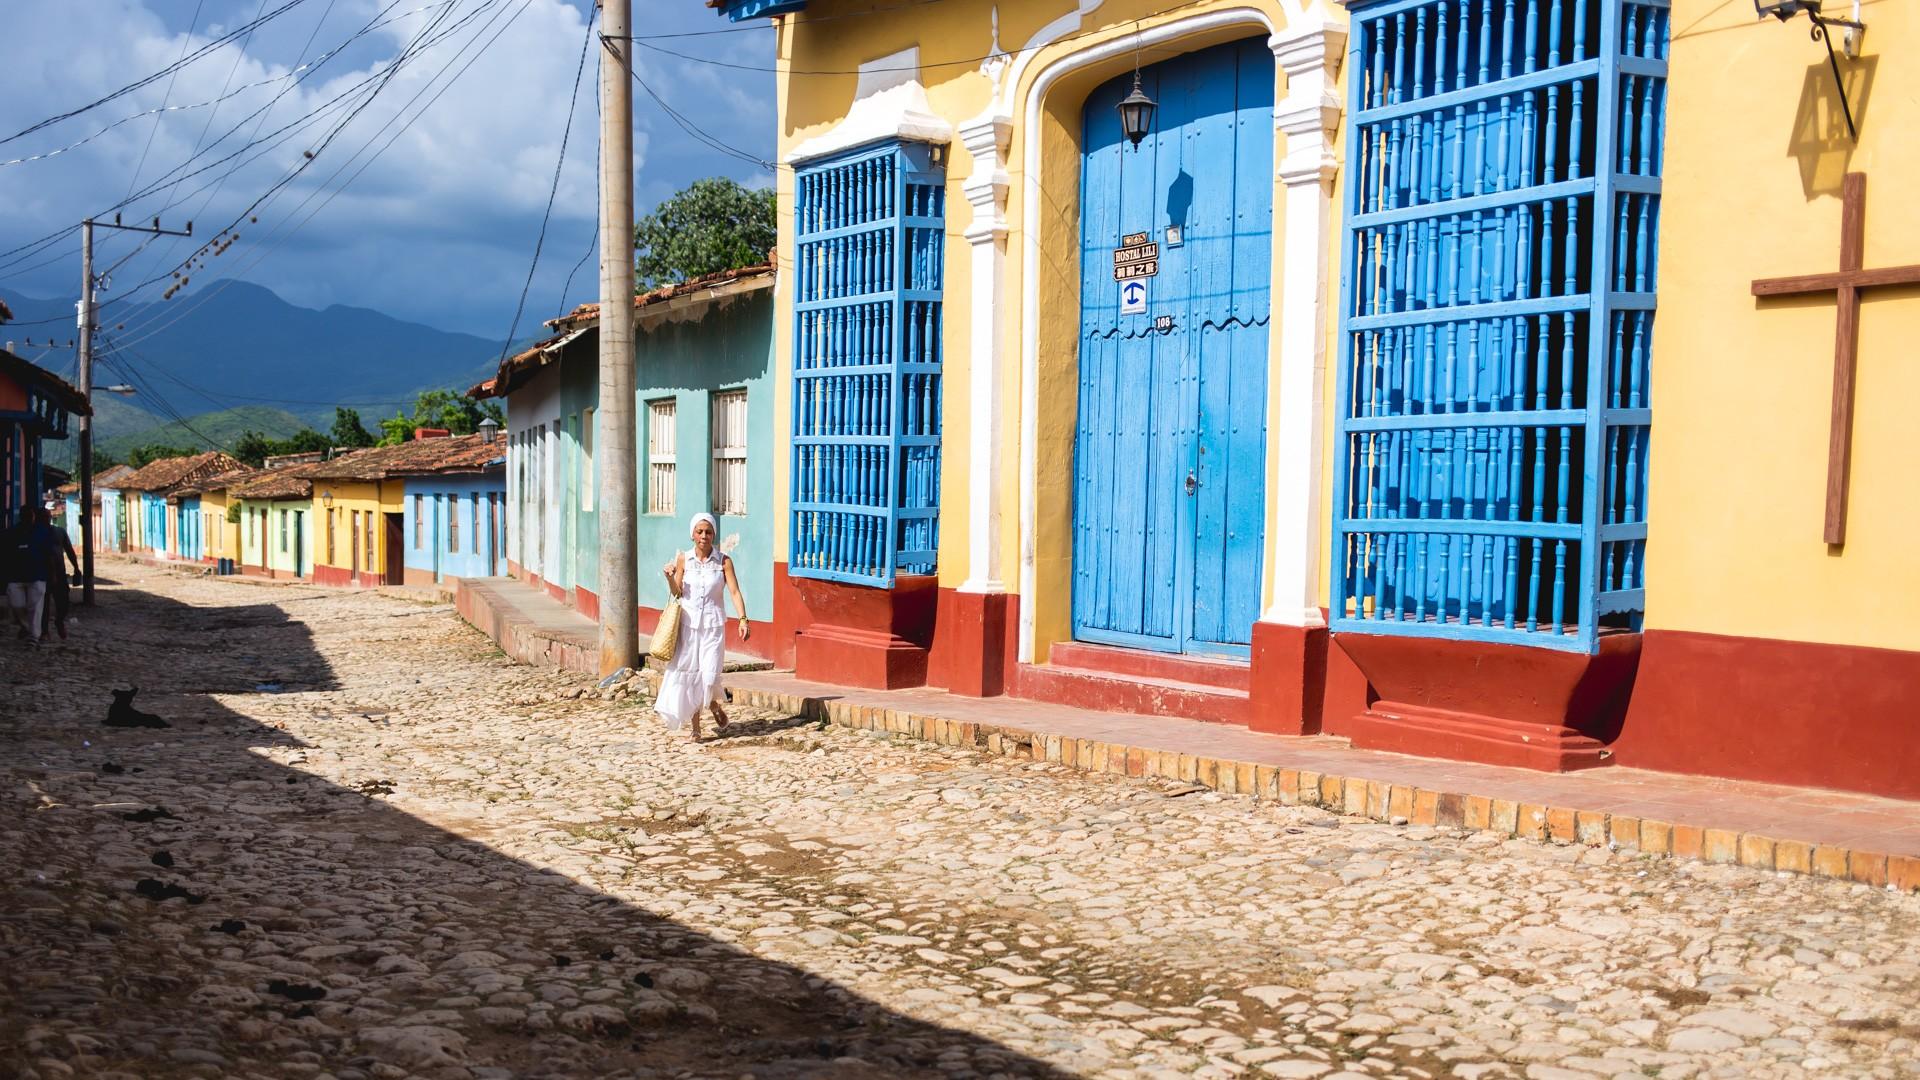 Damien-Dohmen-Photographe-Cuba-33